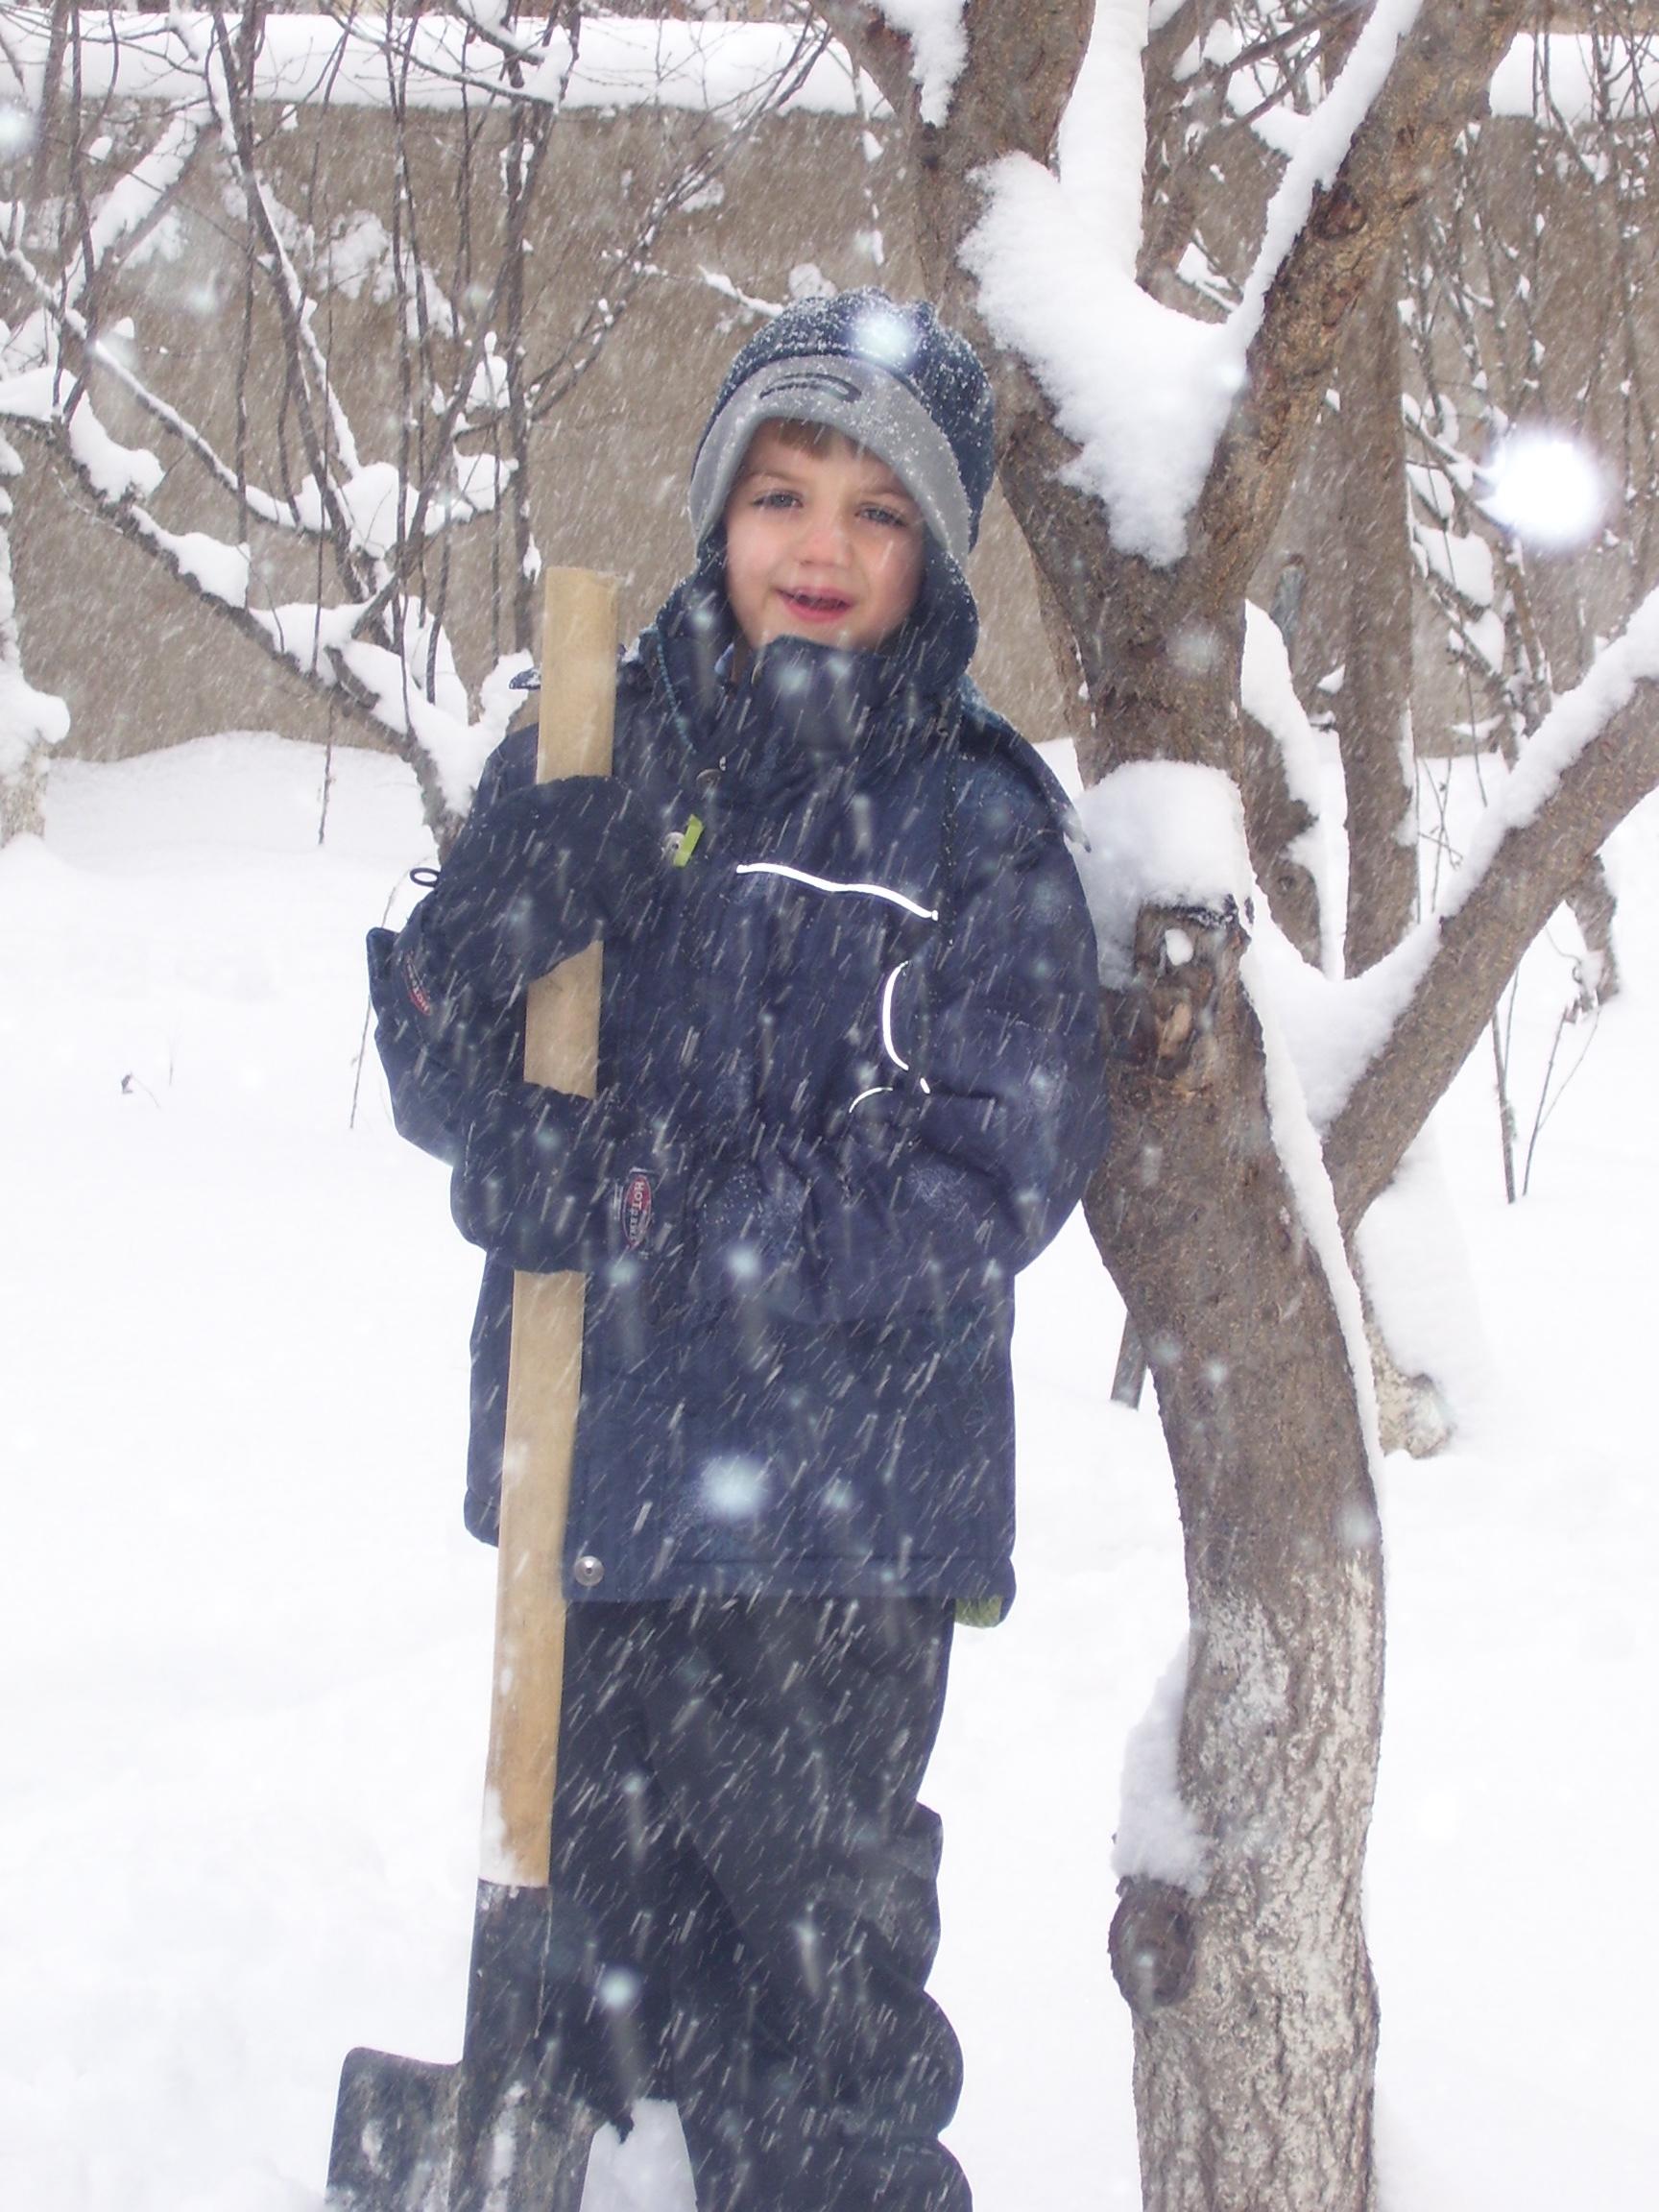 jacob-in-snow.JPG